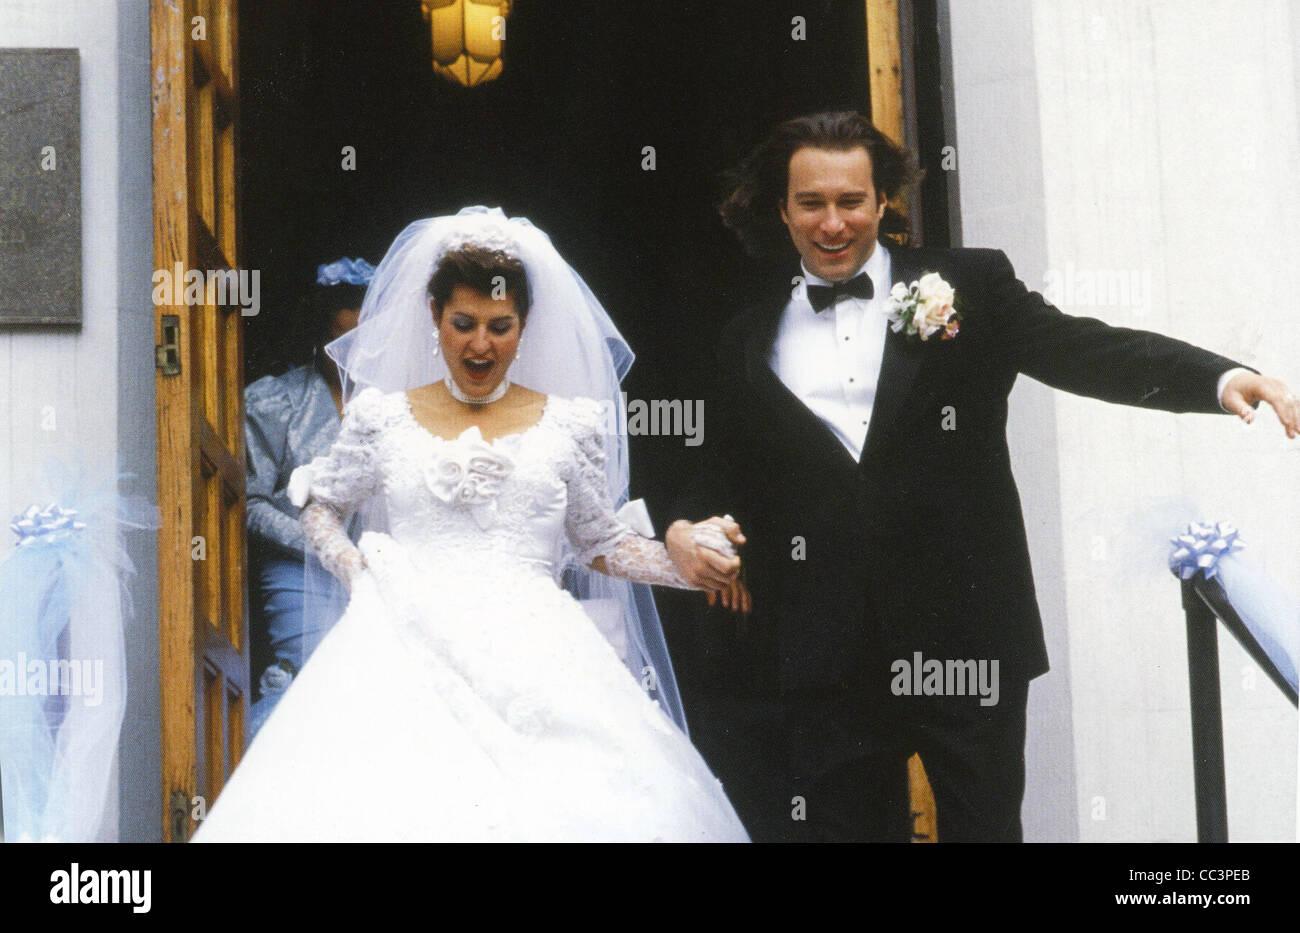 My Big Fat Greek Wedding 2002 Hbo Mph Film Stock Photo Alamy